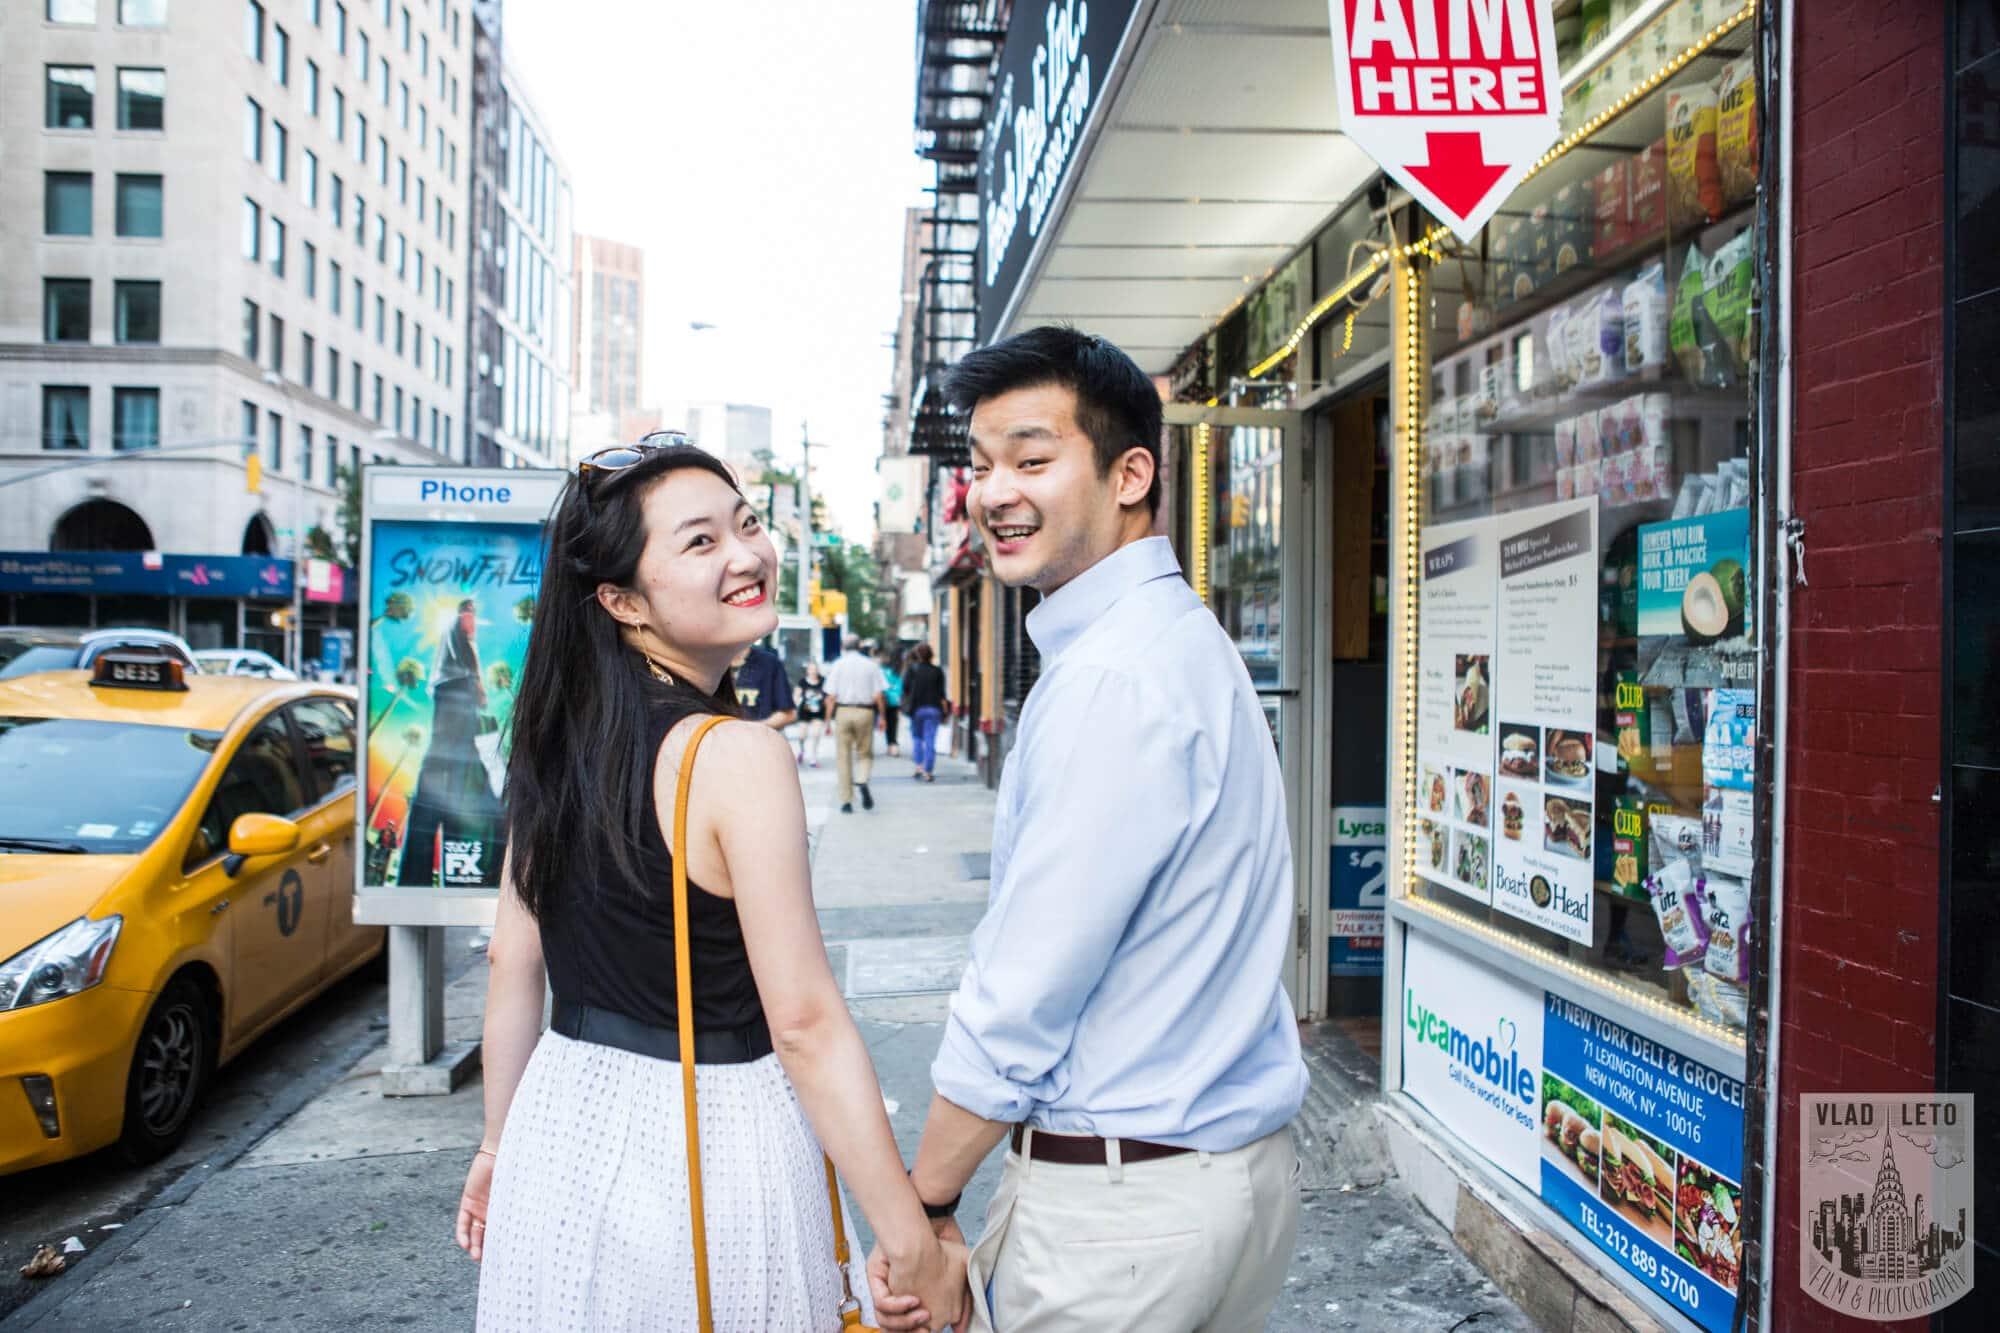 Photo 11 Gramercy Park Marriage Proposal | VladLeto